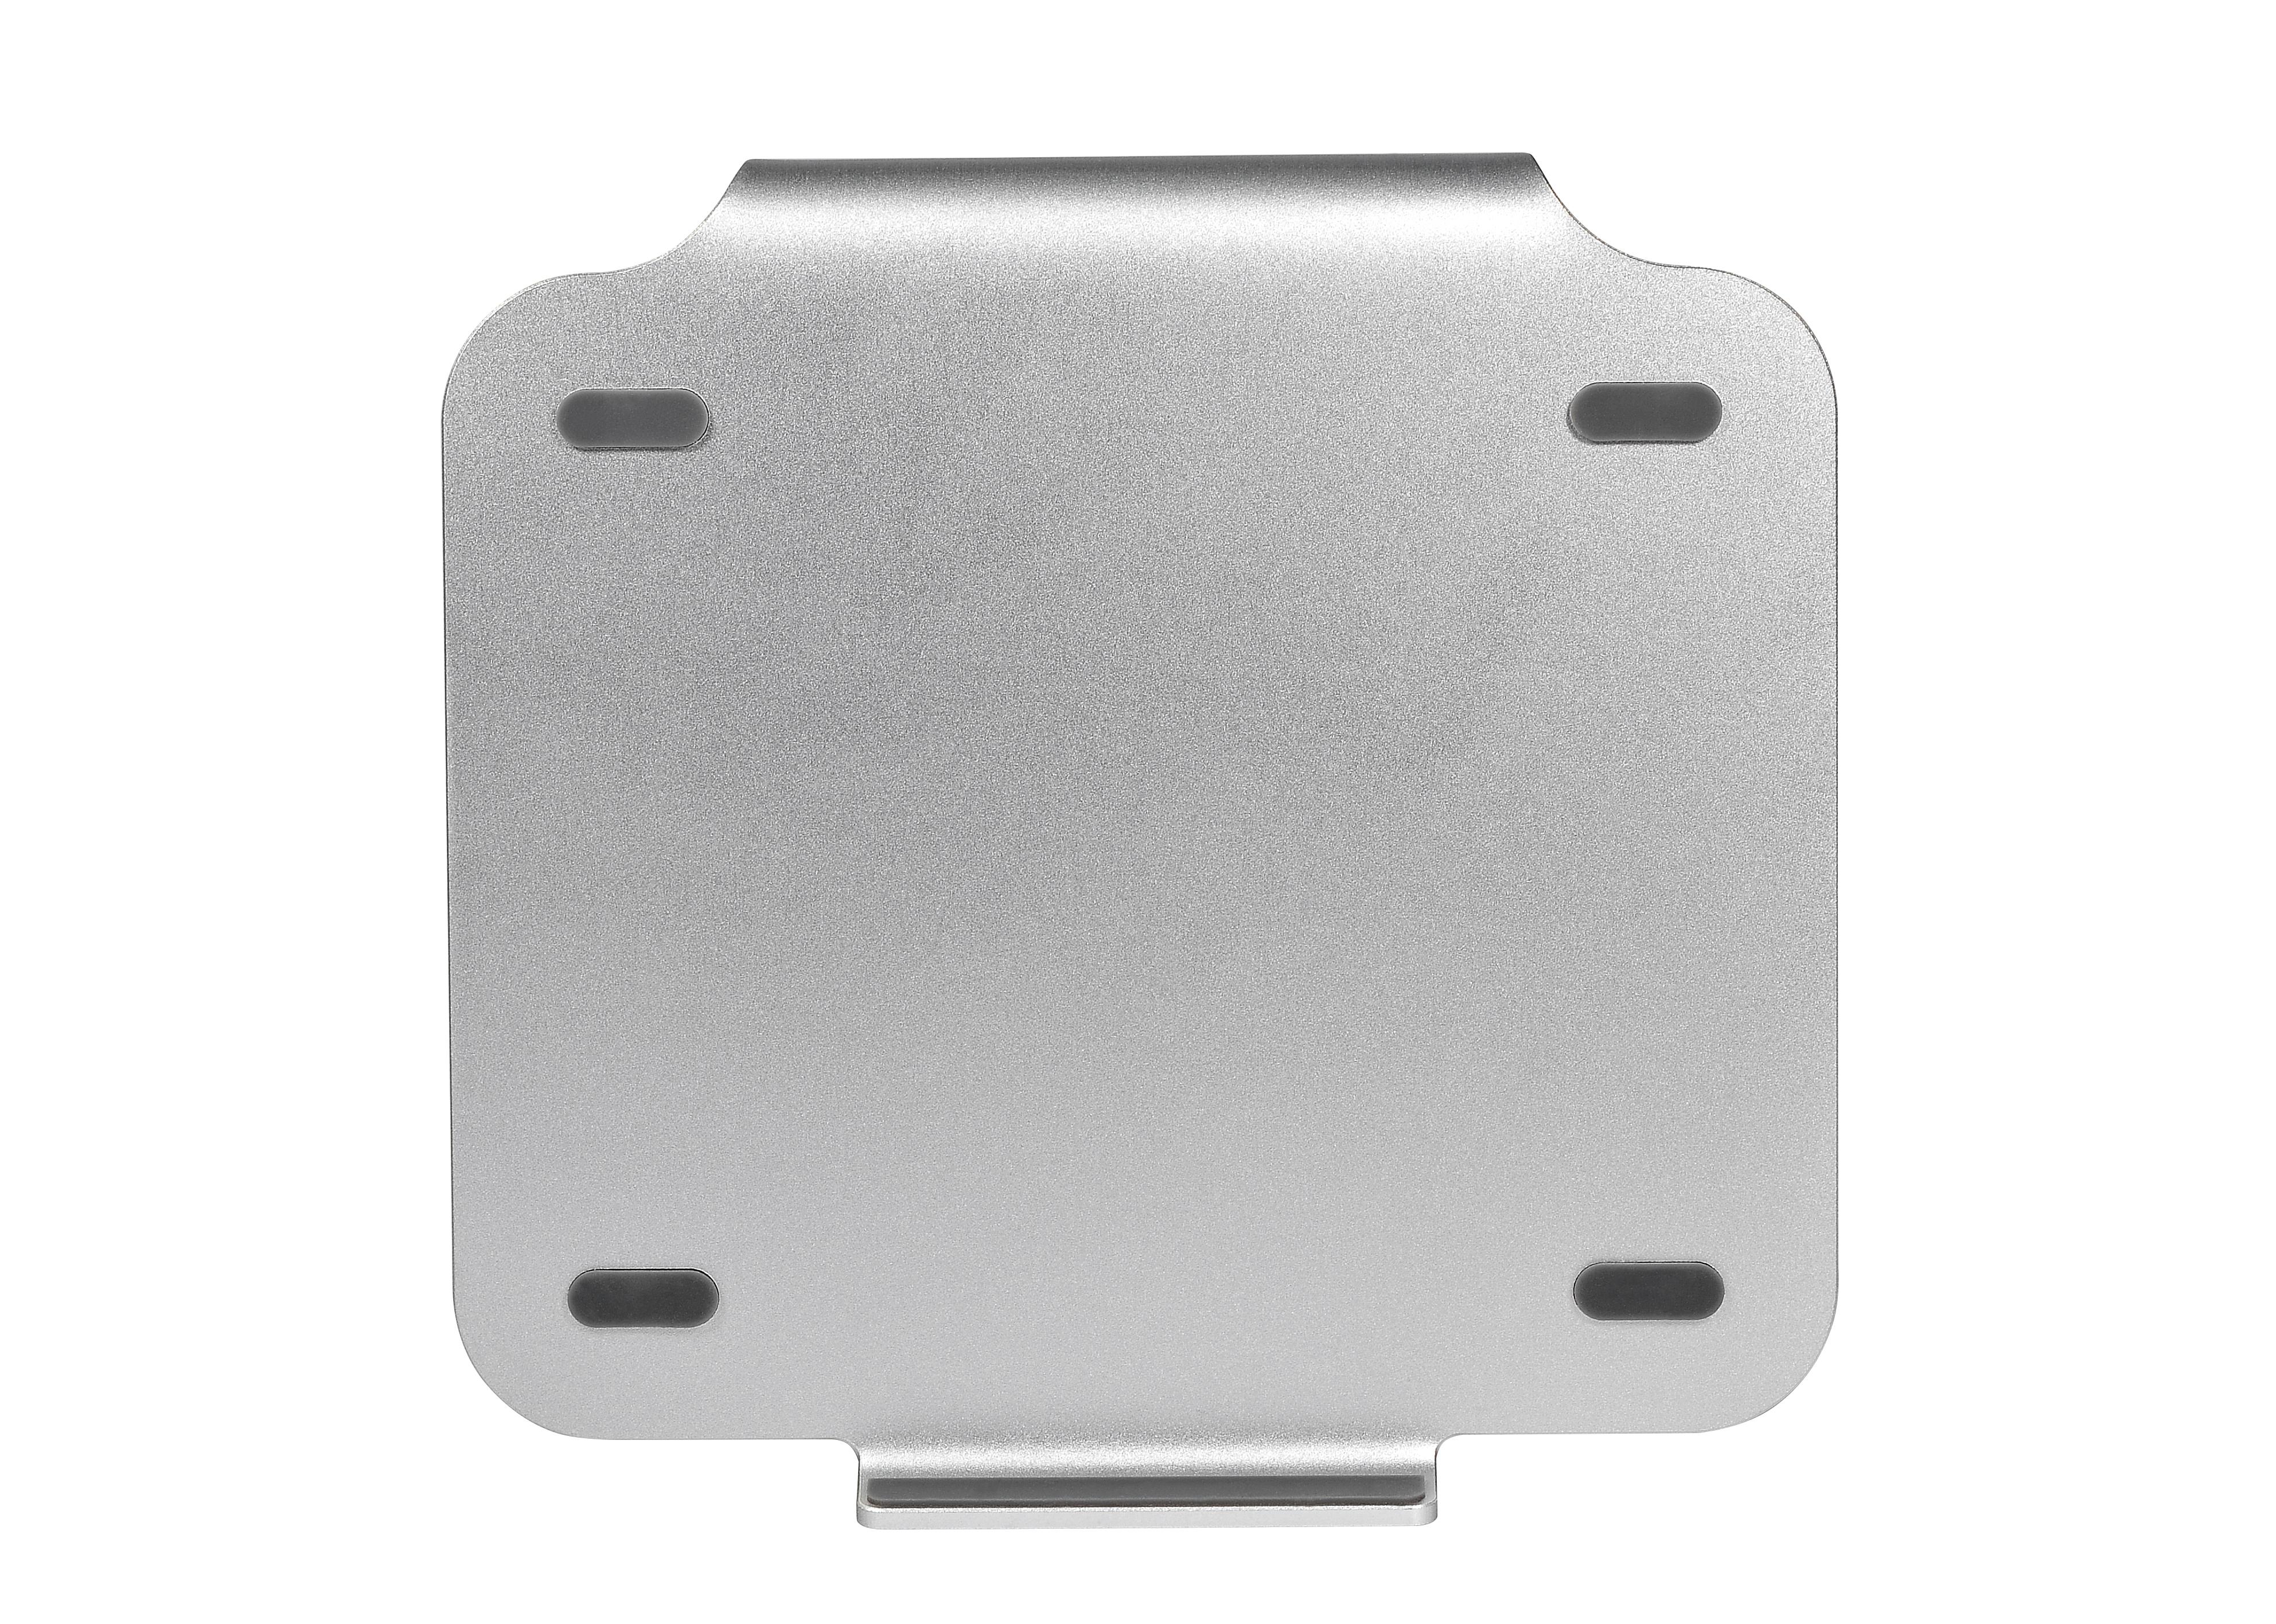 Spire SPUGAP-2S - Notebook-Ständer - Silber - 25,4 cm (10 Zoll) - 43,2 cm (17 Zoll) - Aluminium - 251 mm